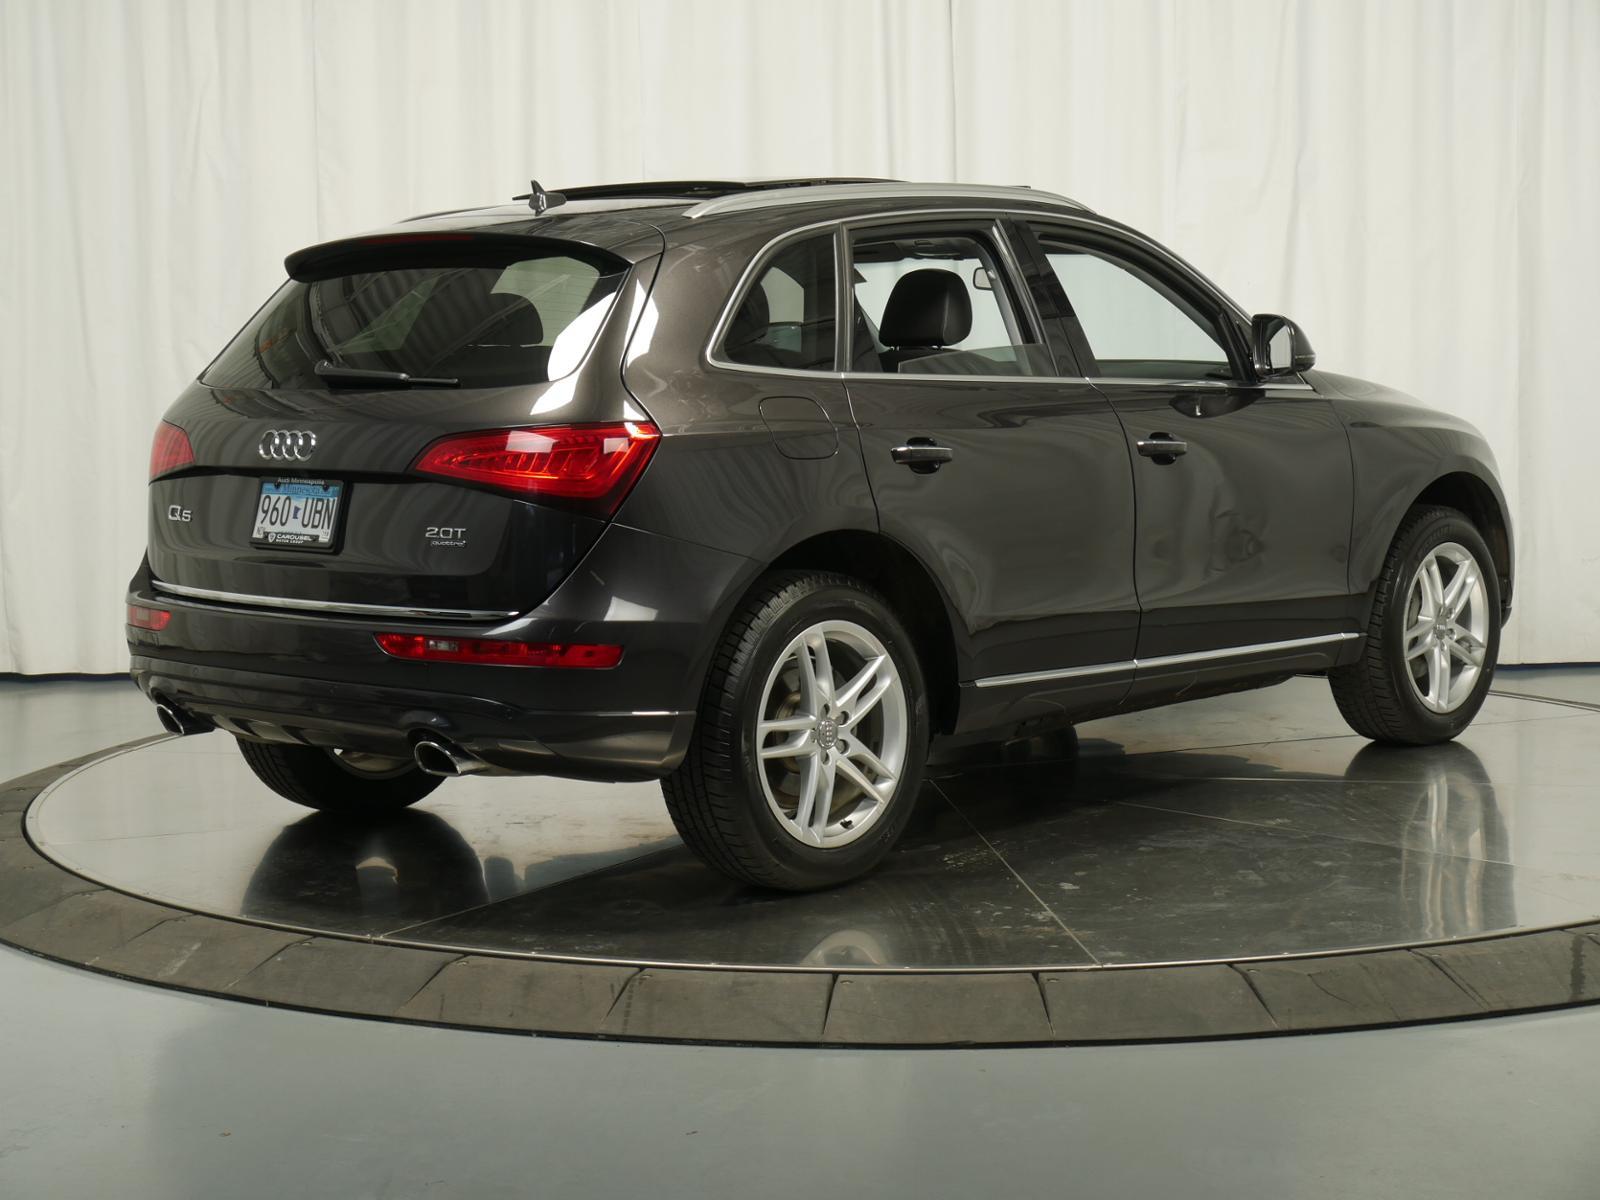 Used 2016 Audi Q5 For Sale at Audi Minneapolis | VIN: WA1L2AFP9GA042201